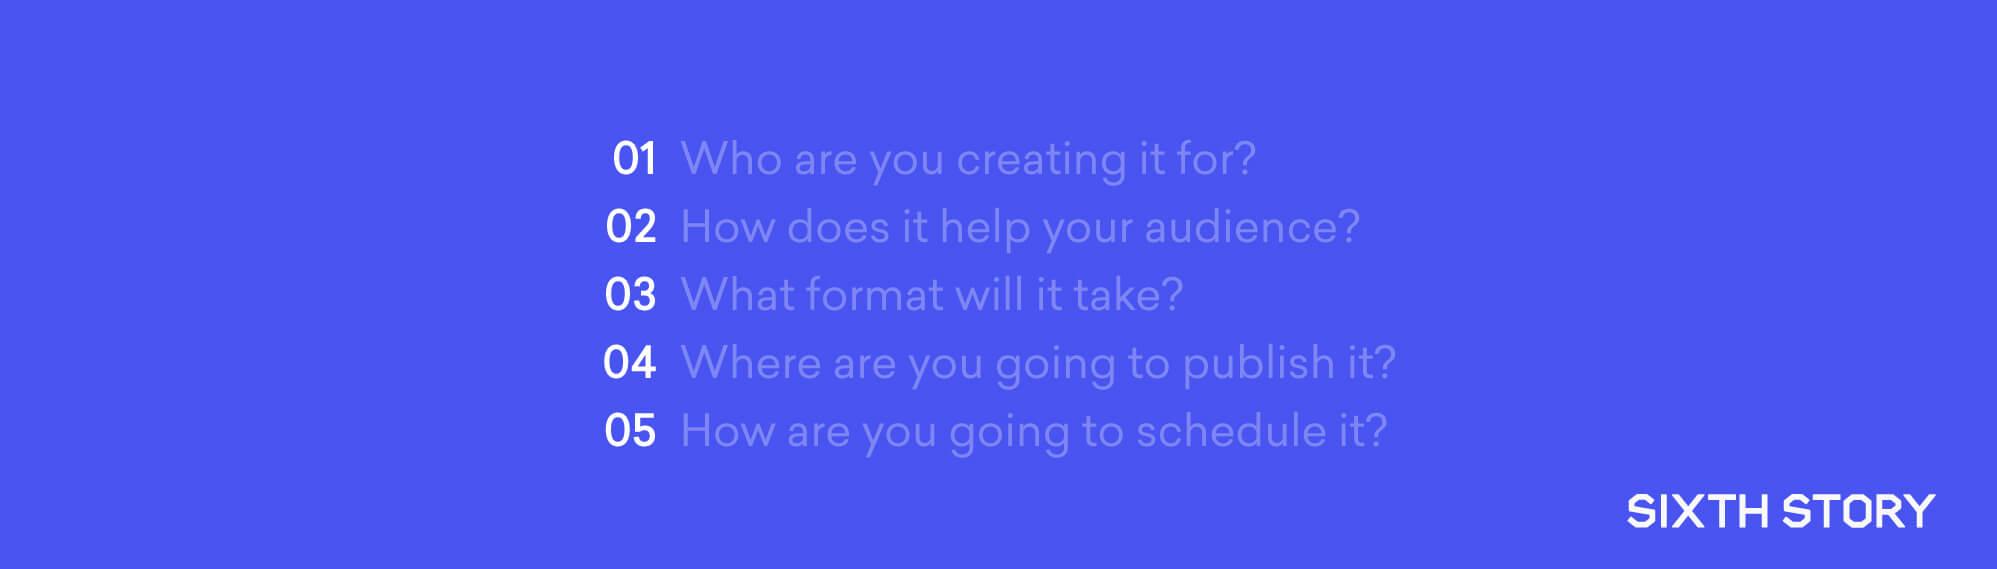 content marketing schedule